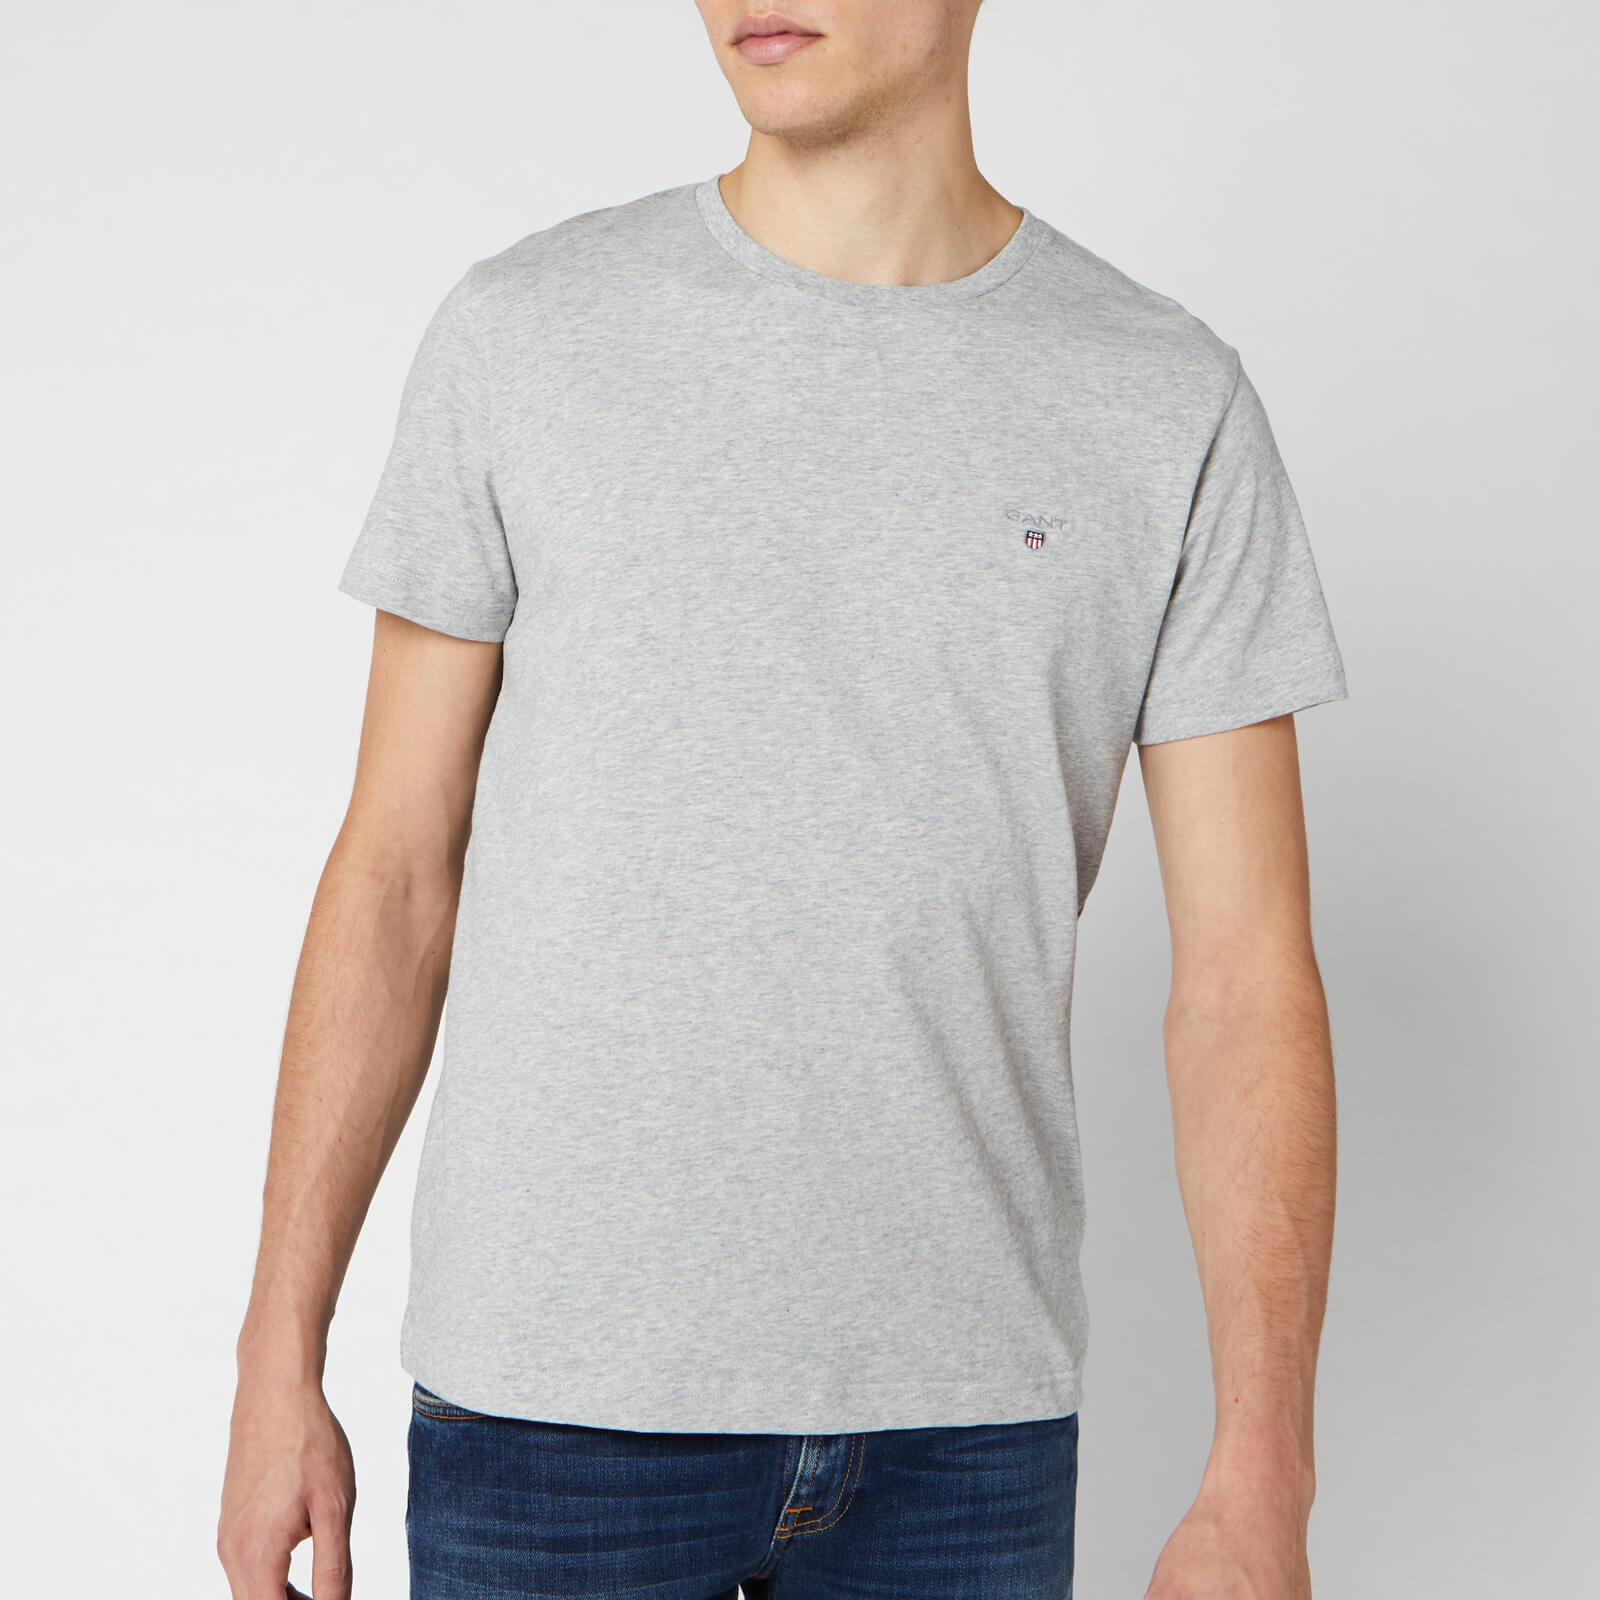 Gant Mens The The Original T-Shirt